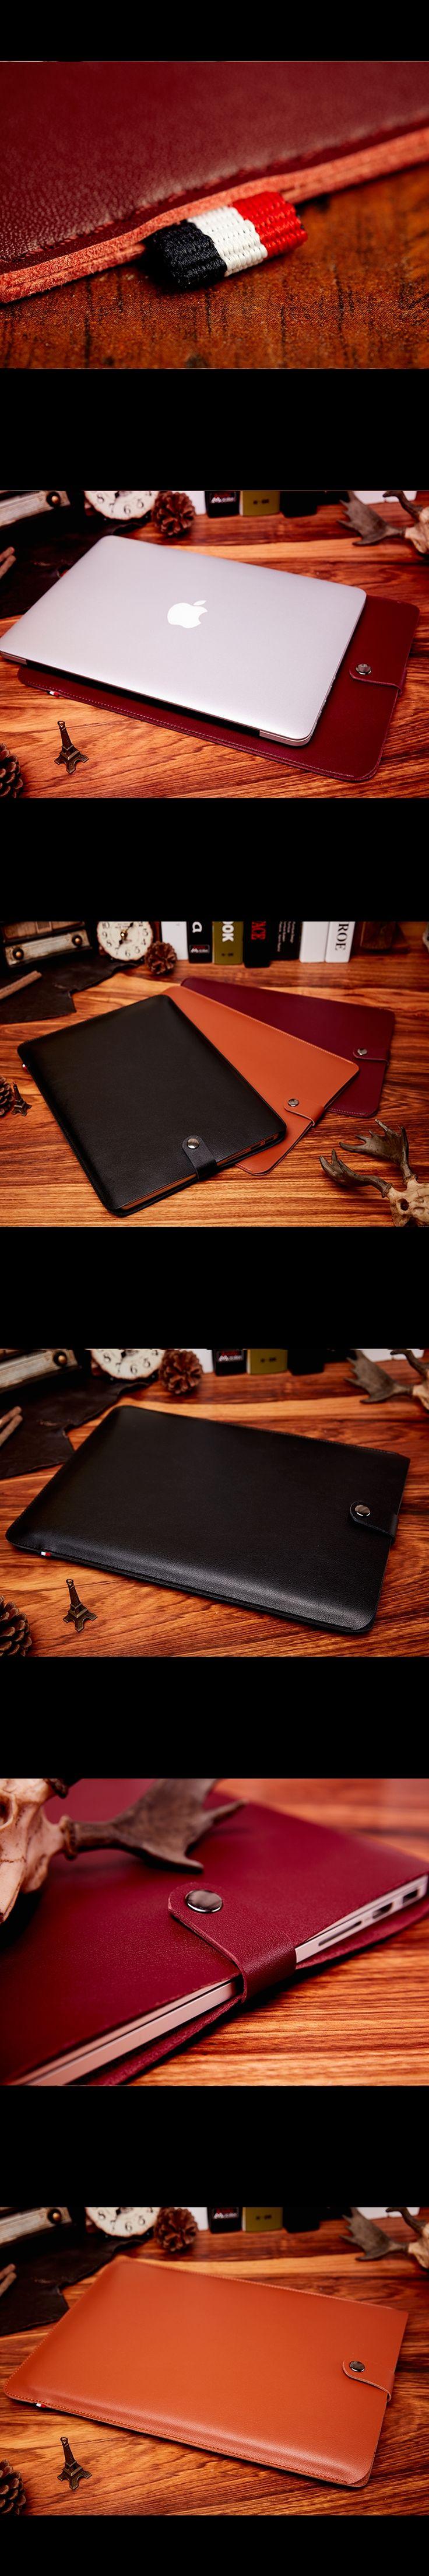 "KALIDI Waterproof Notebook Laptop Sleeve Bag Case for 11"" 12"" 13 Inch Macbook Air/Pro/Retina Ultrathin Womens Envelope Briefcase"